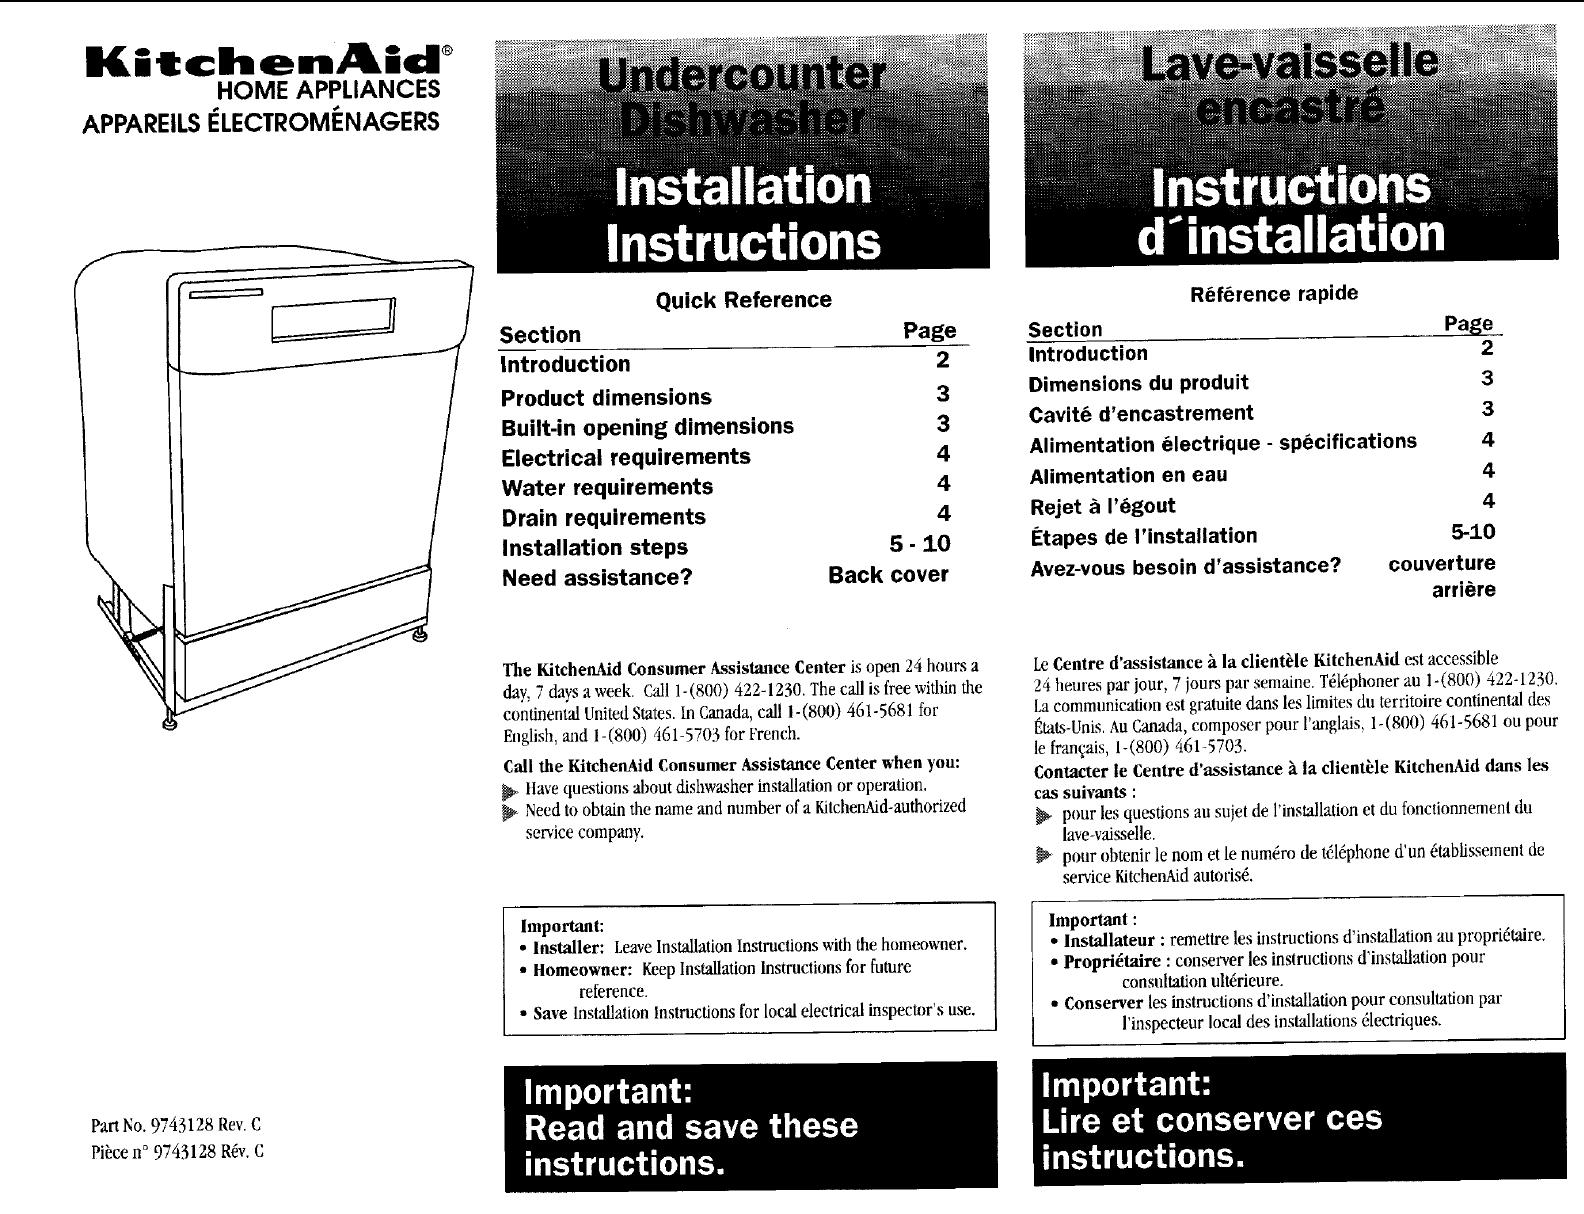 Kitchenaid Kuds24seal2 User Manual Undercounter Dishwasher Manuals Wiring Diagram And Guides L0711326